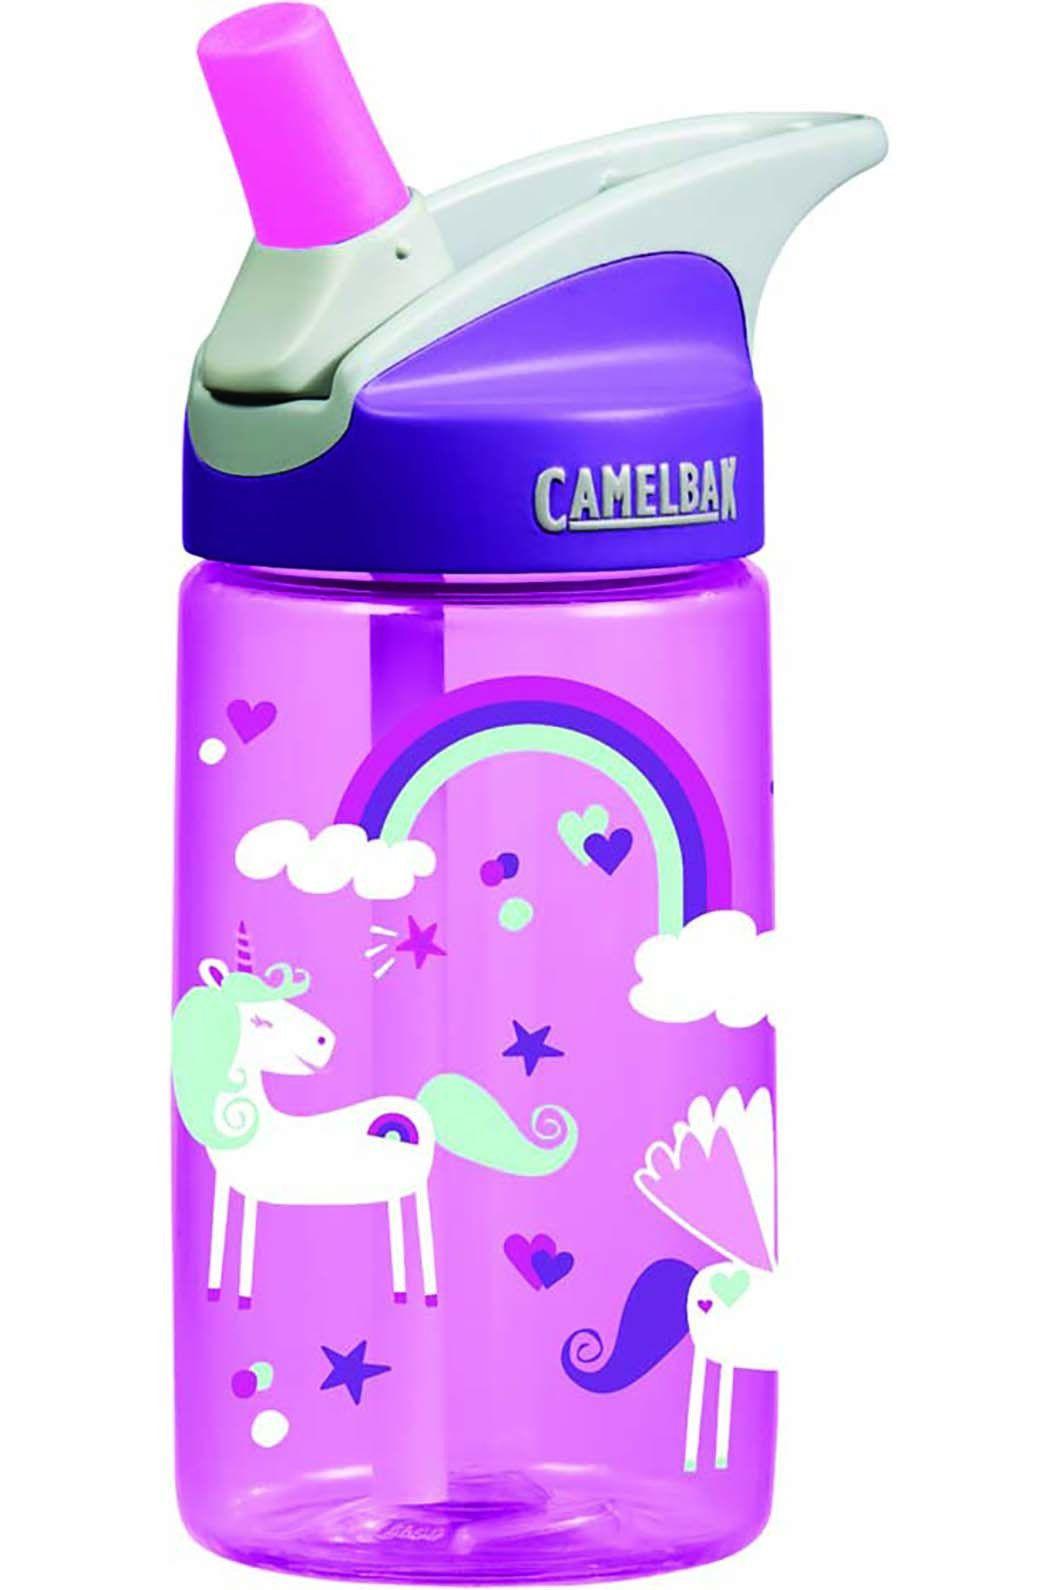 Camelbak Eddy Kids' Drink Bottle, None, hi-res